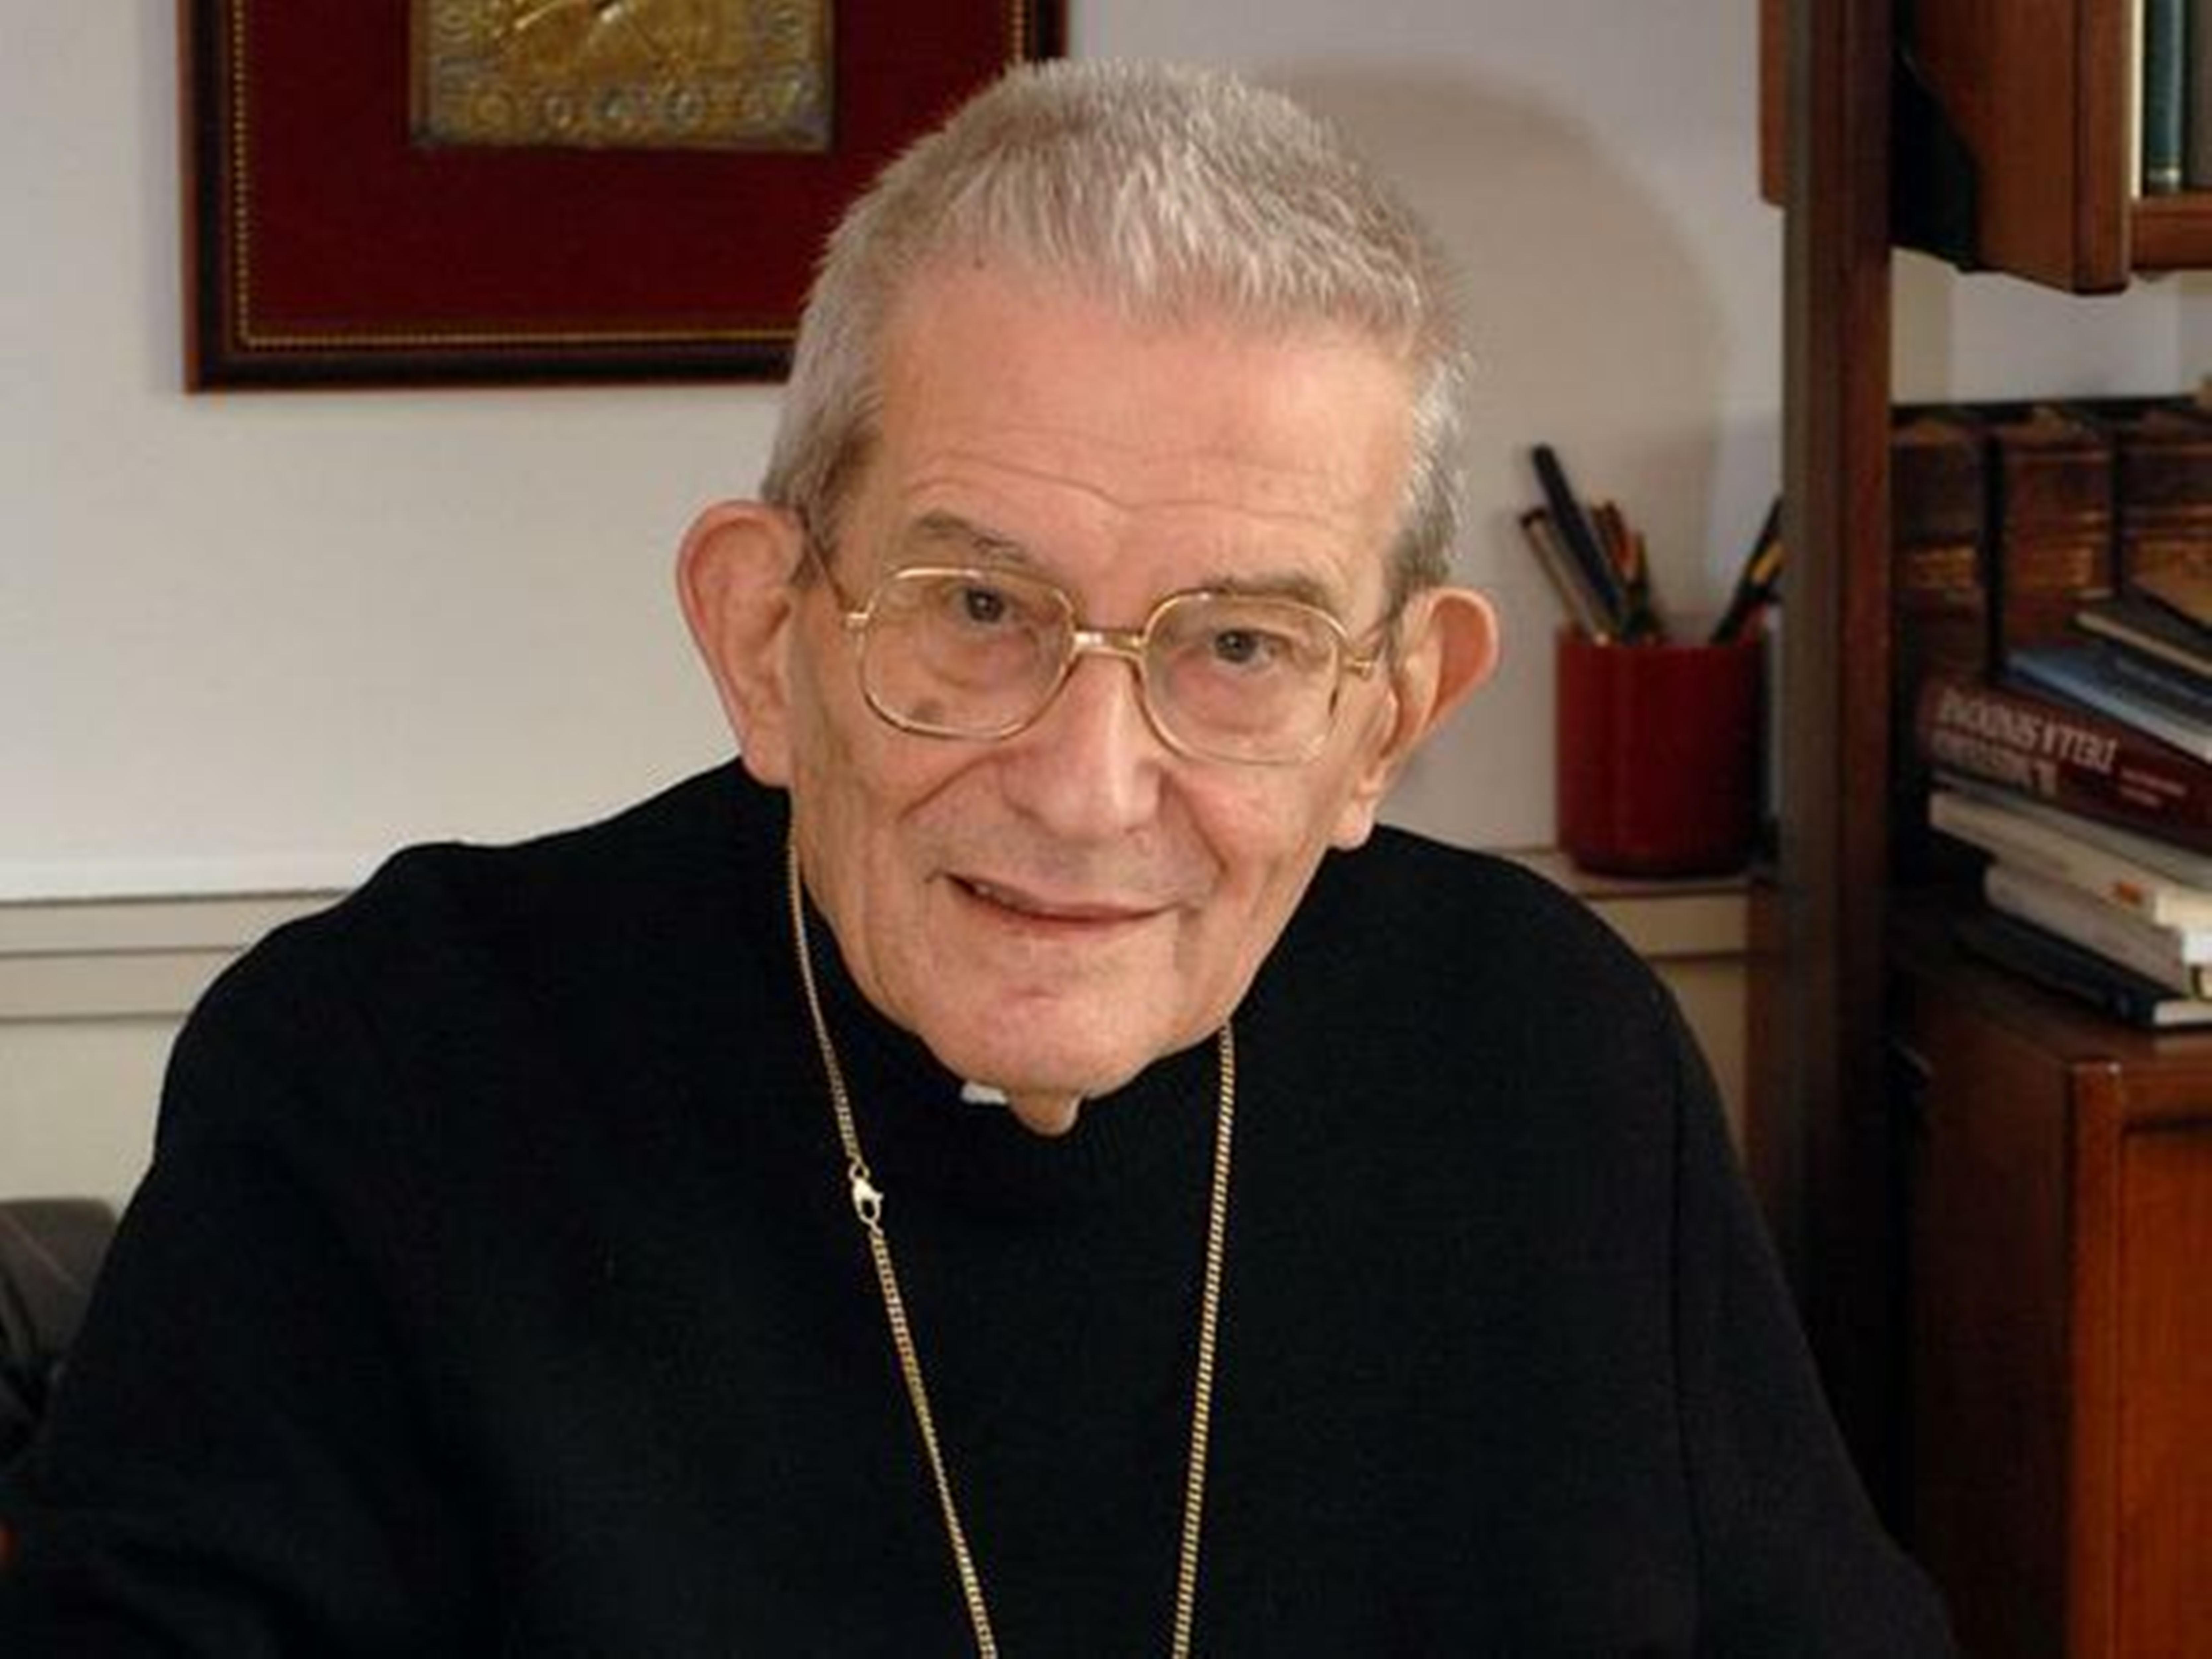 Cardinal Loris Capovilla